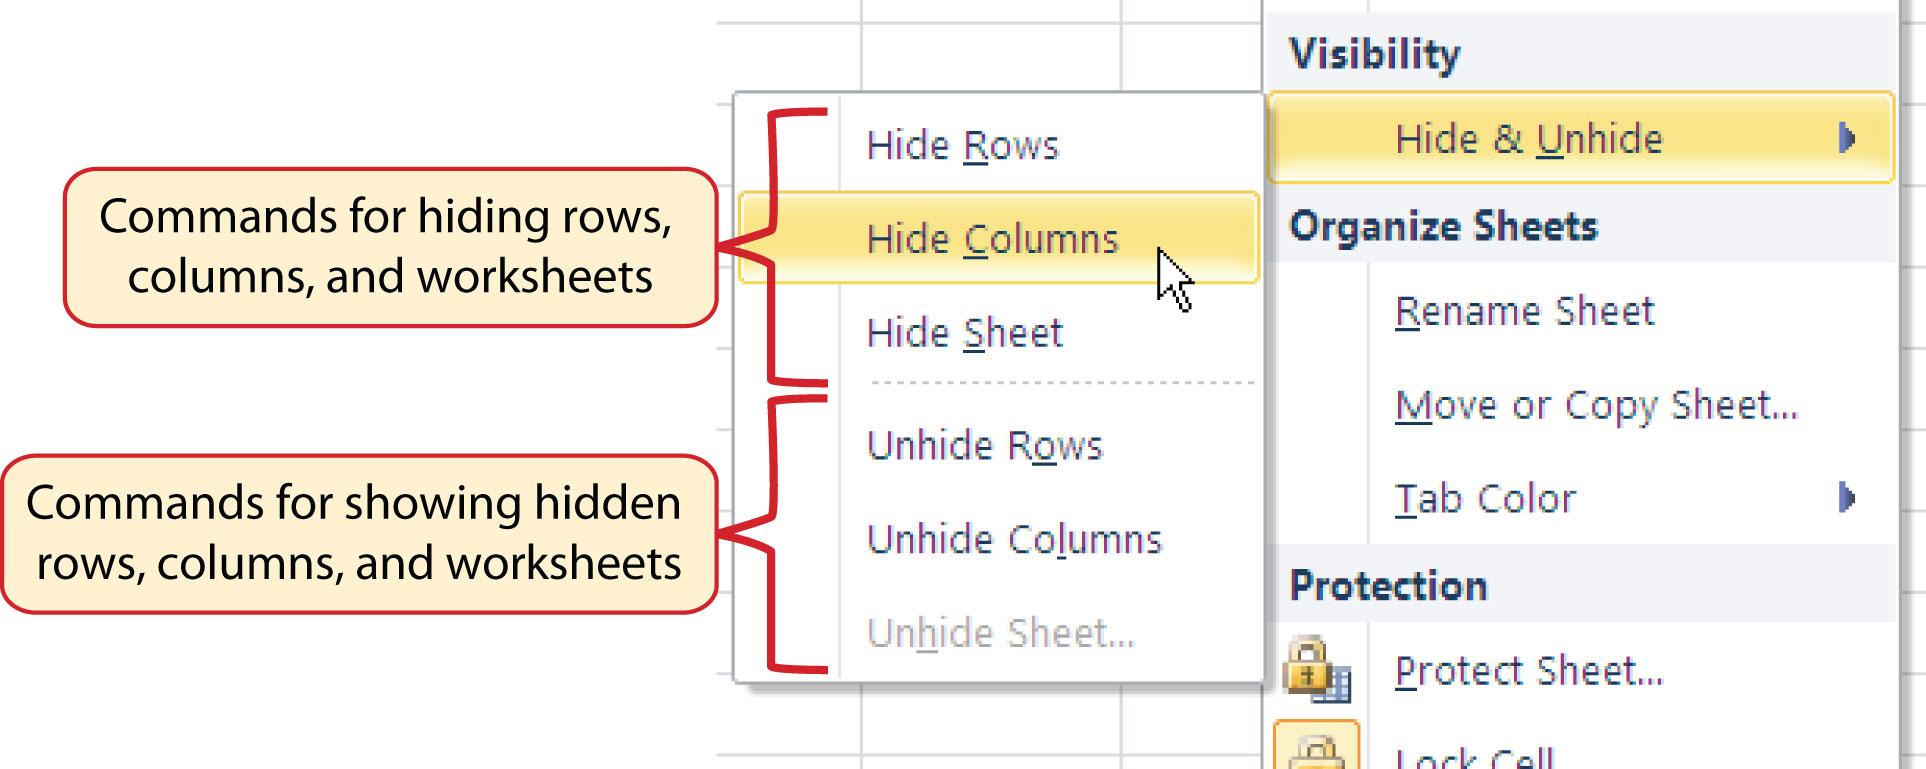 worksheet Excel Hide Worksheet entering editing and managing data figure 1 30 hide unhide submenu